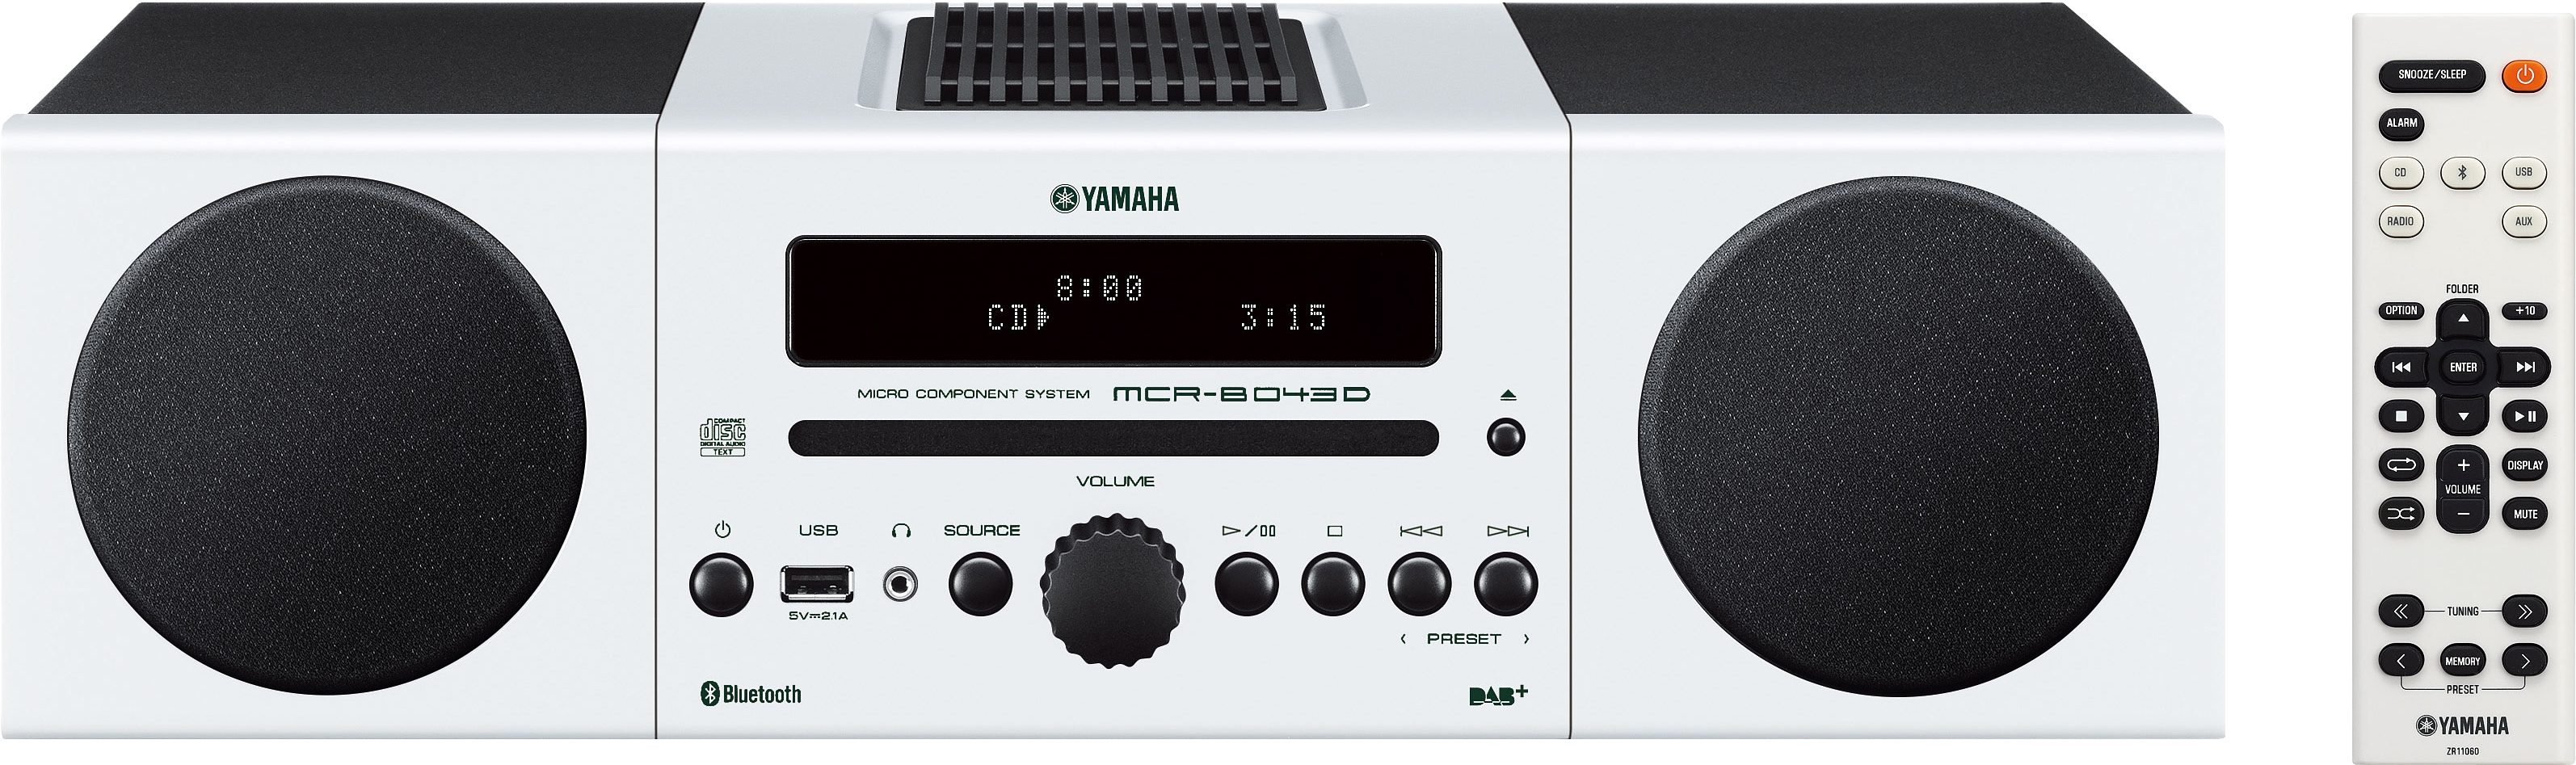 Yamaha MCR-B043D Kompaktanlage, Bluetooth, Digitalradio (DAB+), 1x USB